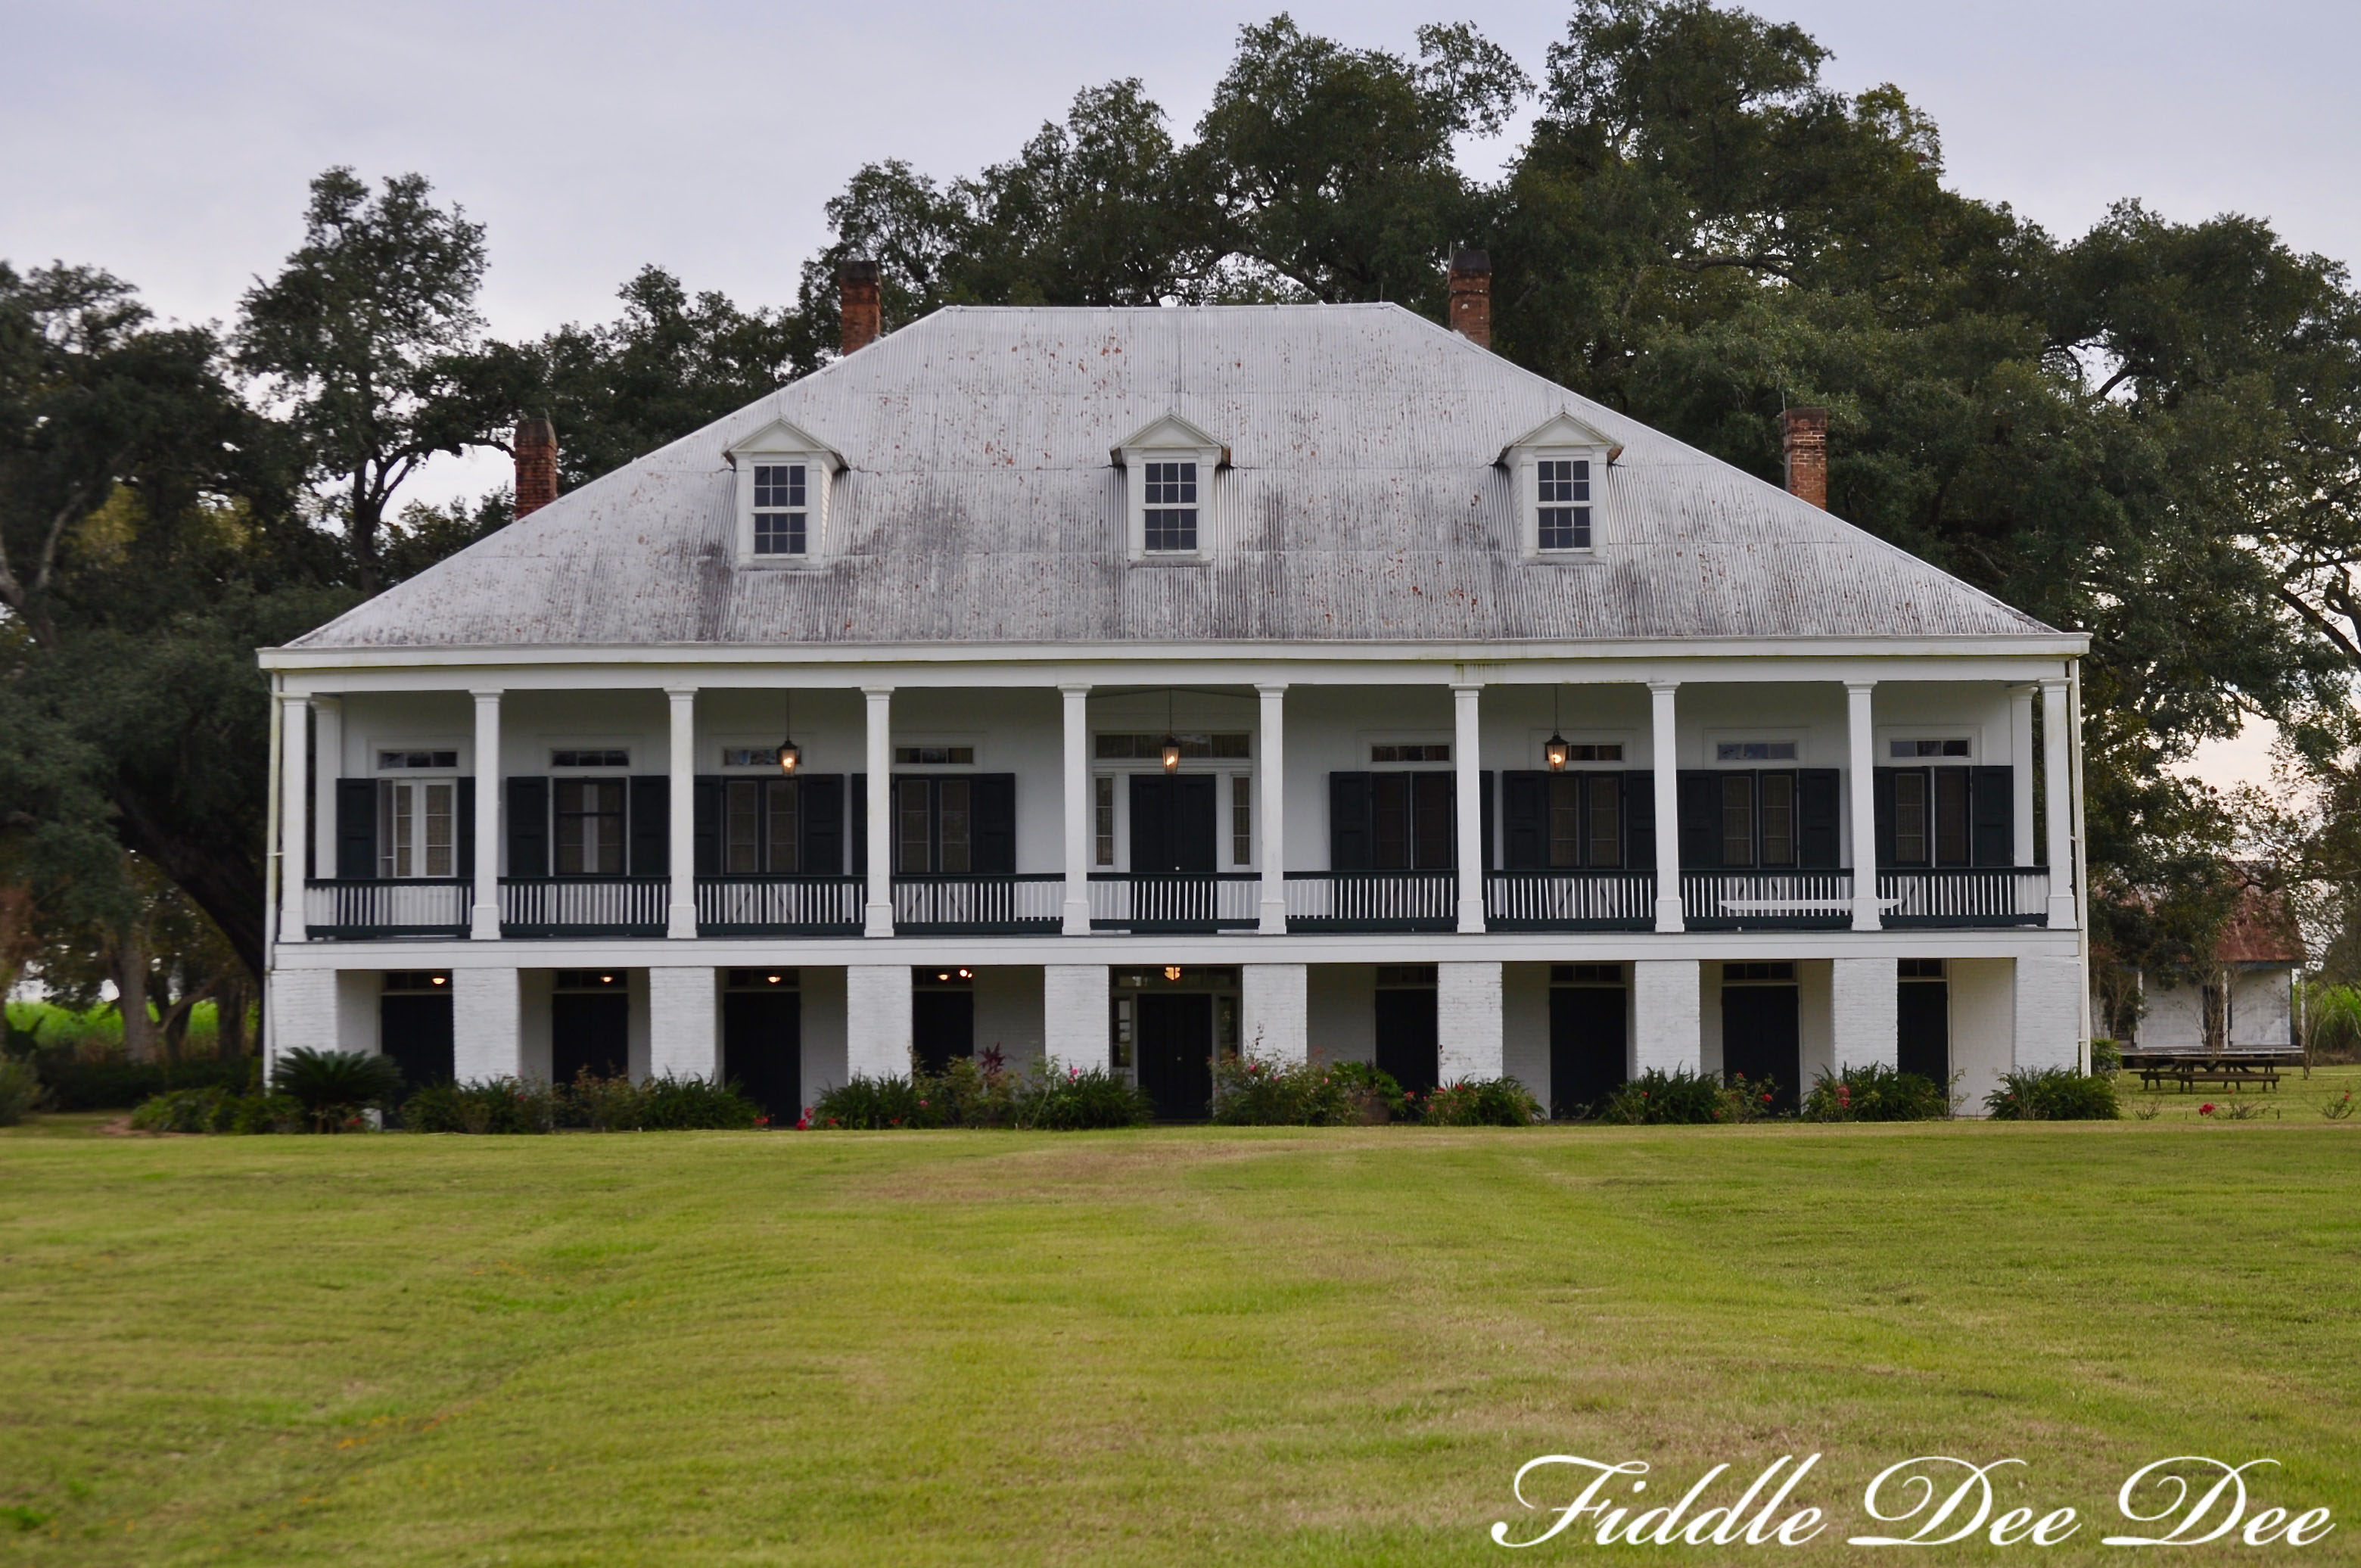 saint-josephs-plantation-ohfiddledeedee-com